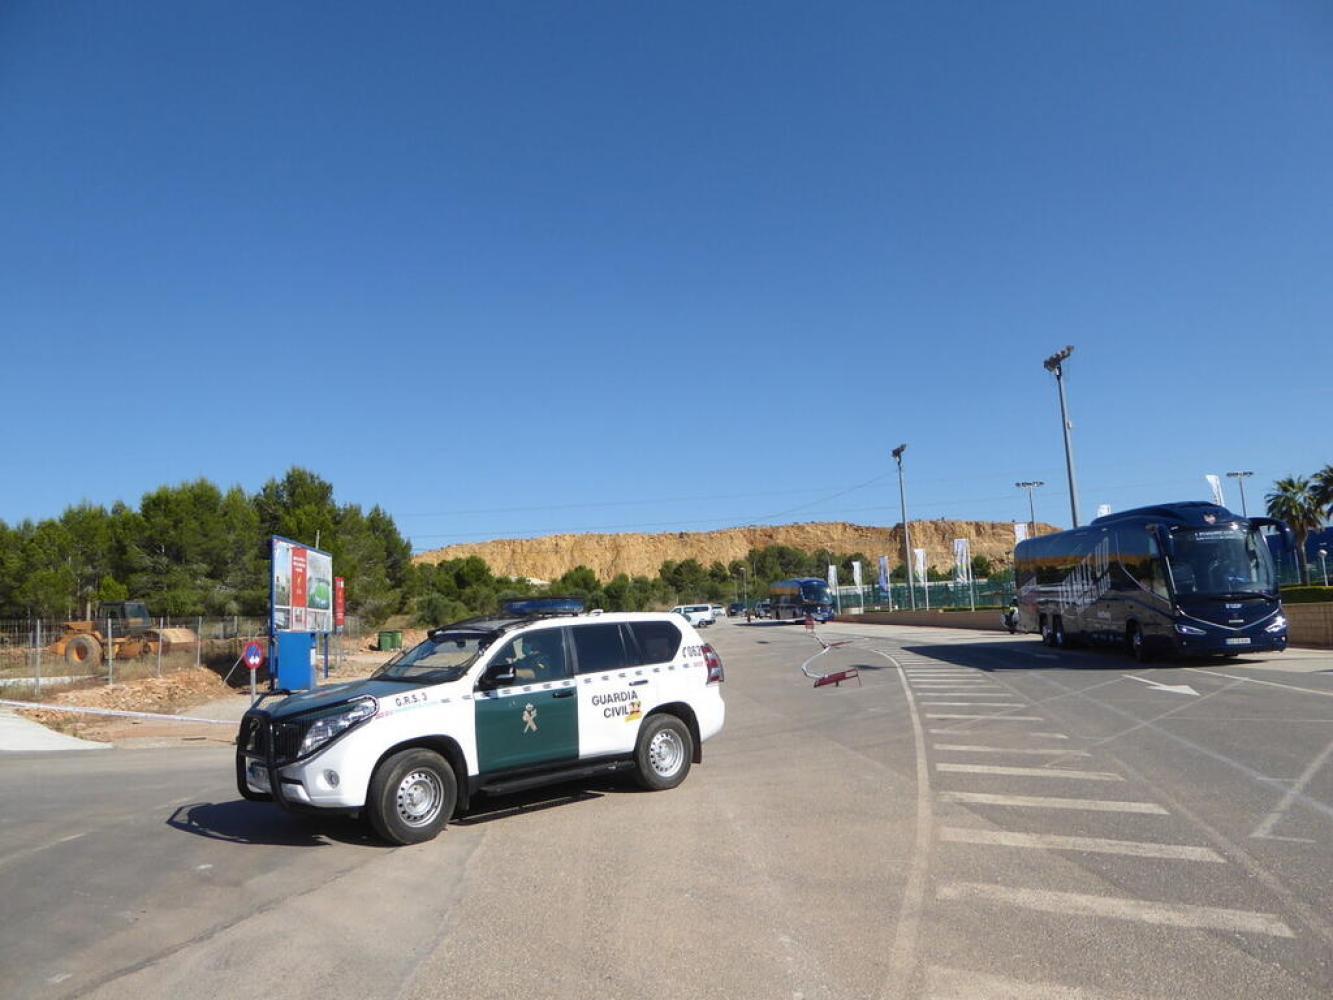 La Nucia EOlimpic Levante vs Sevilla seguridad 1 2020